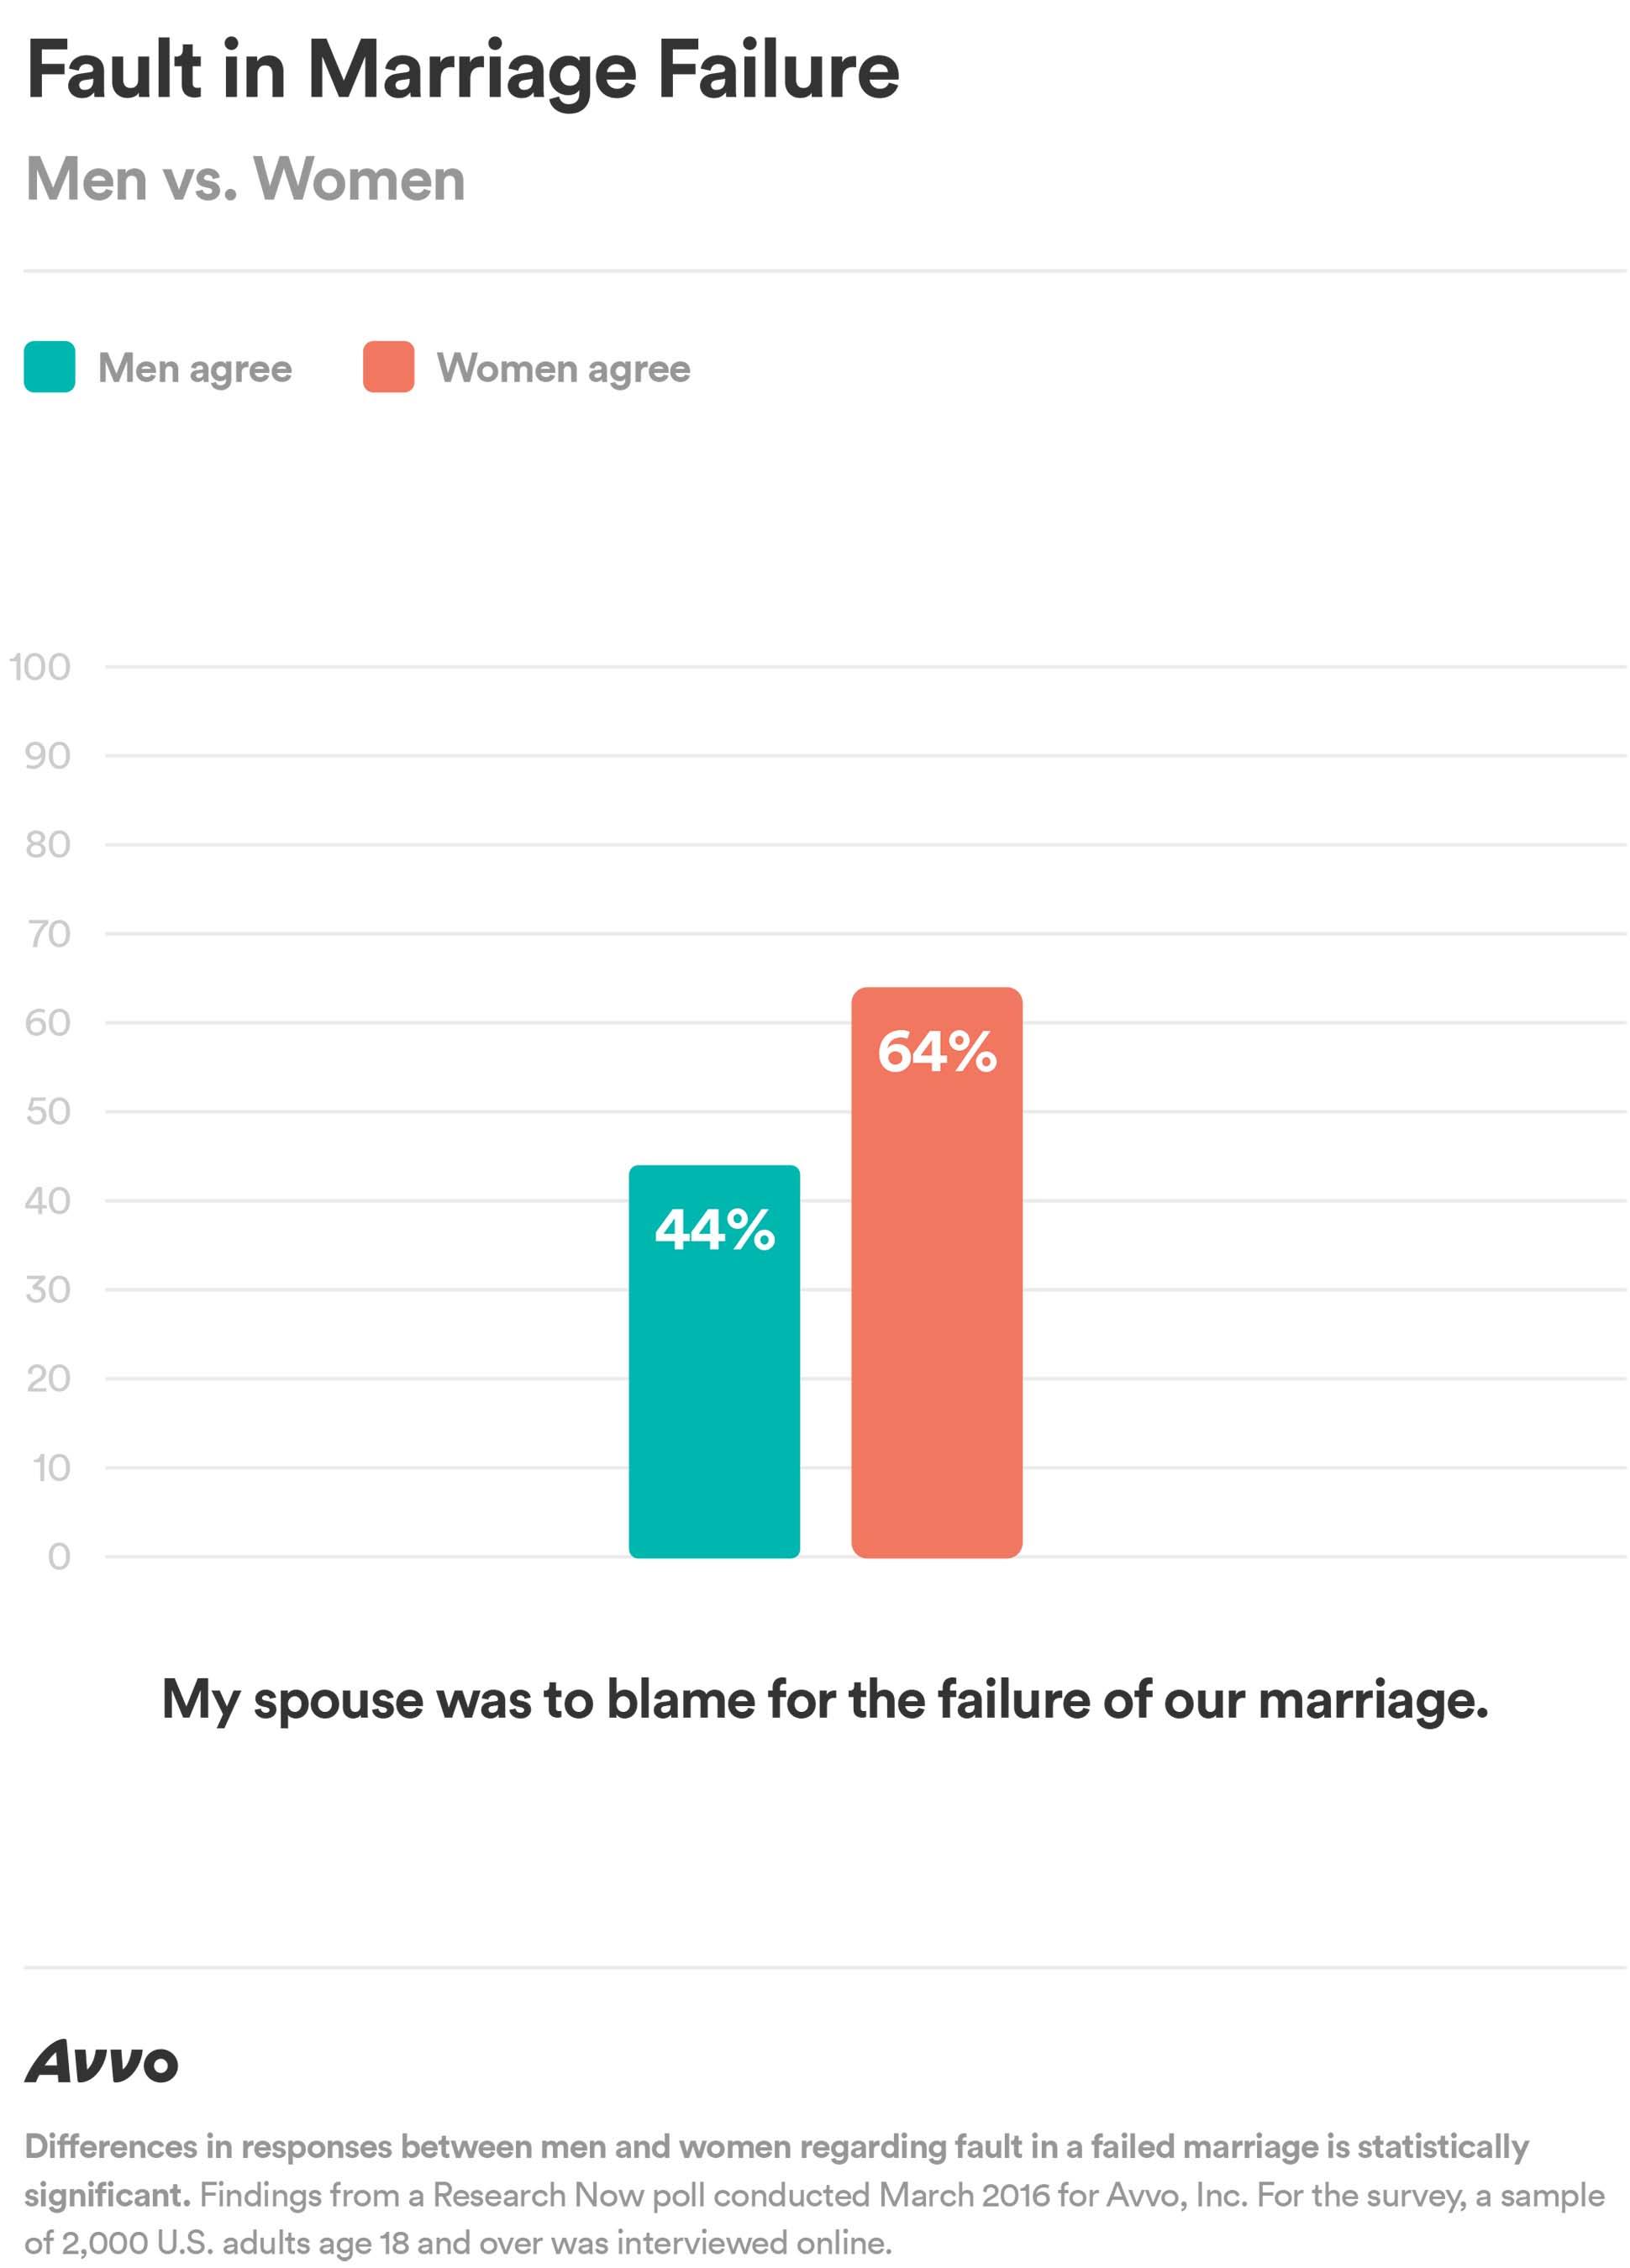 Fault in Marriage Failure – Men vs. Women